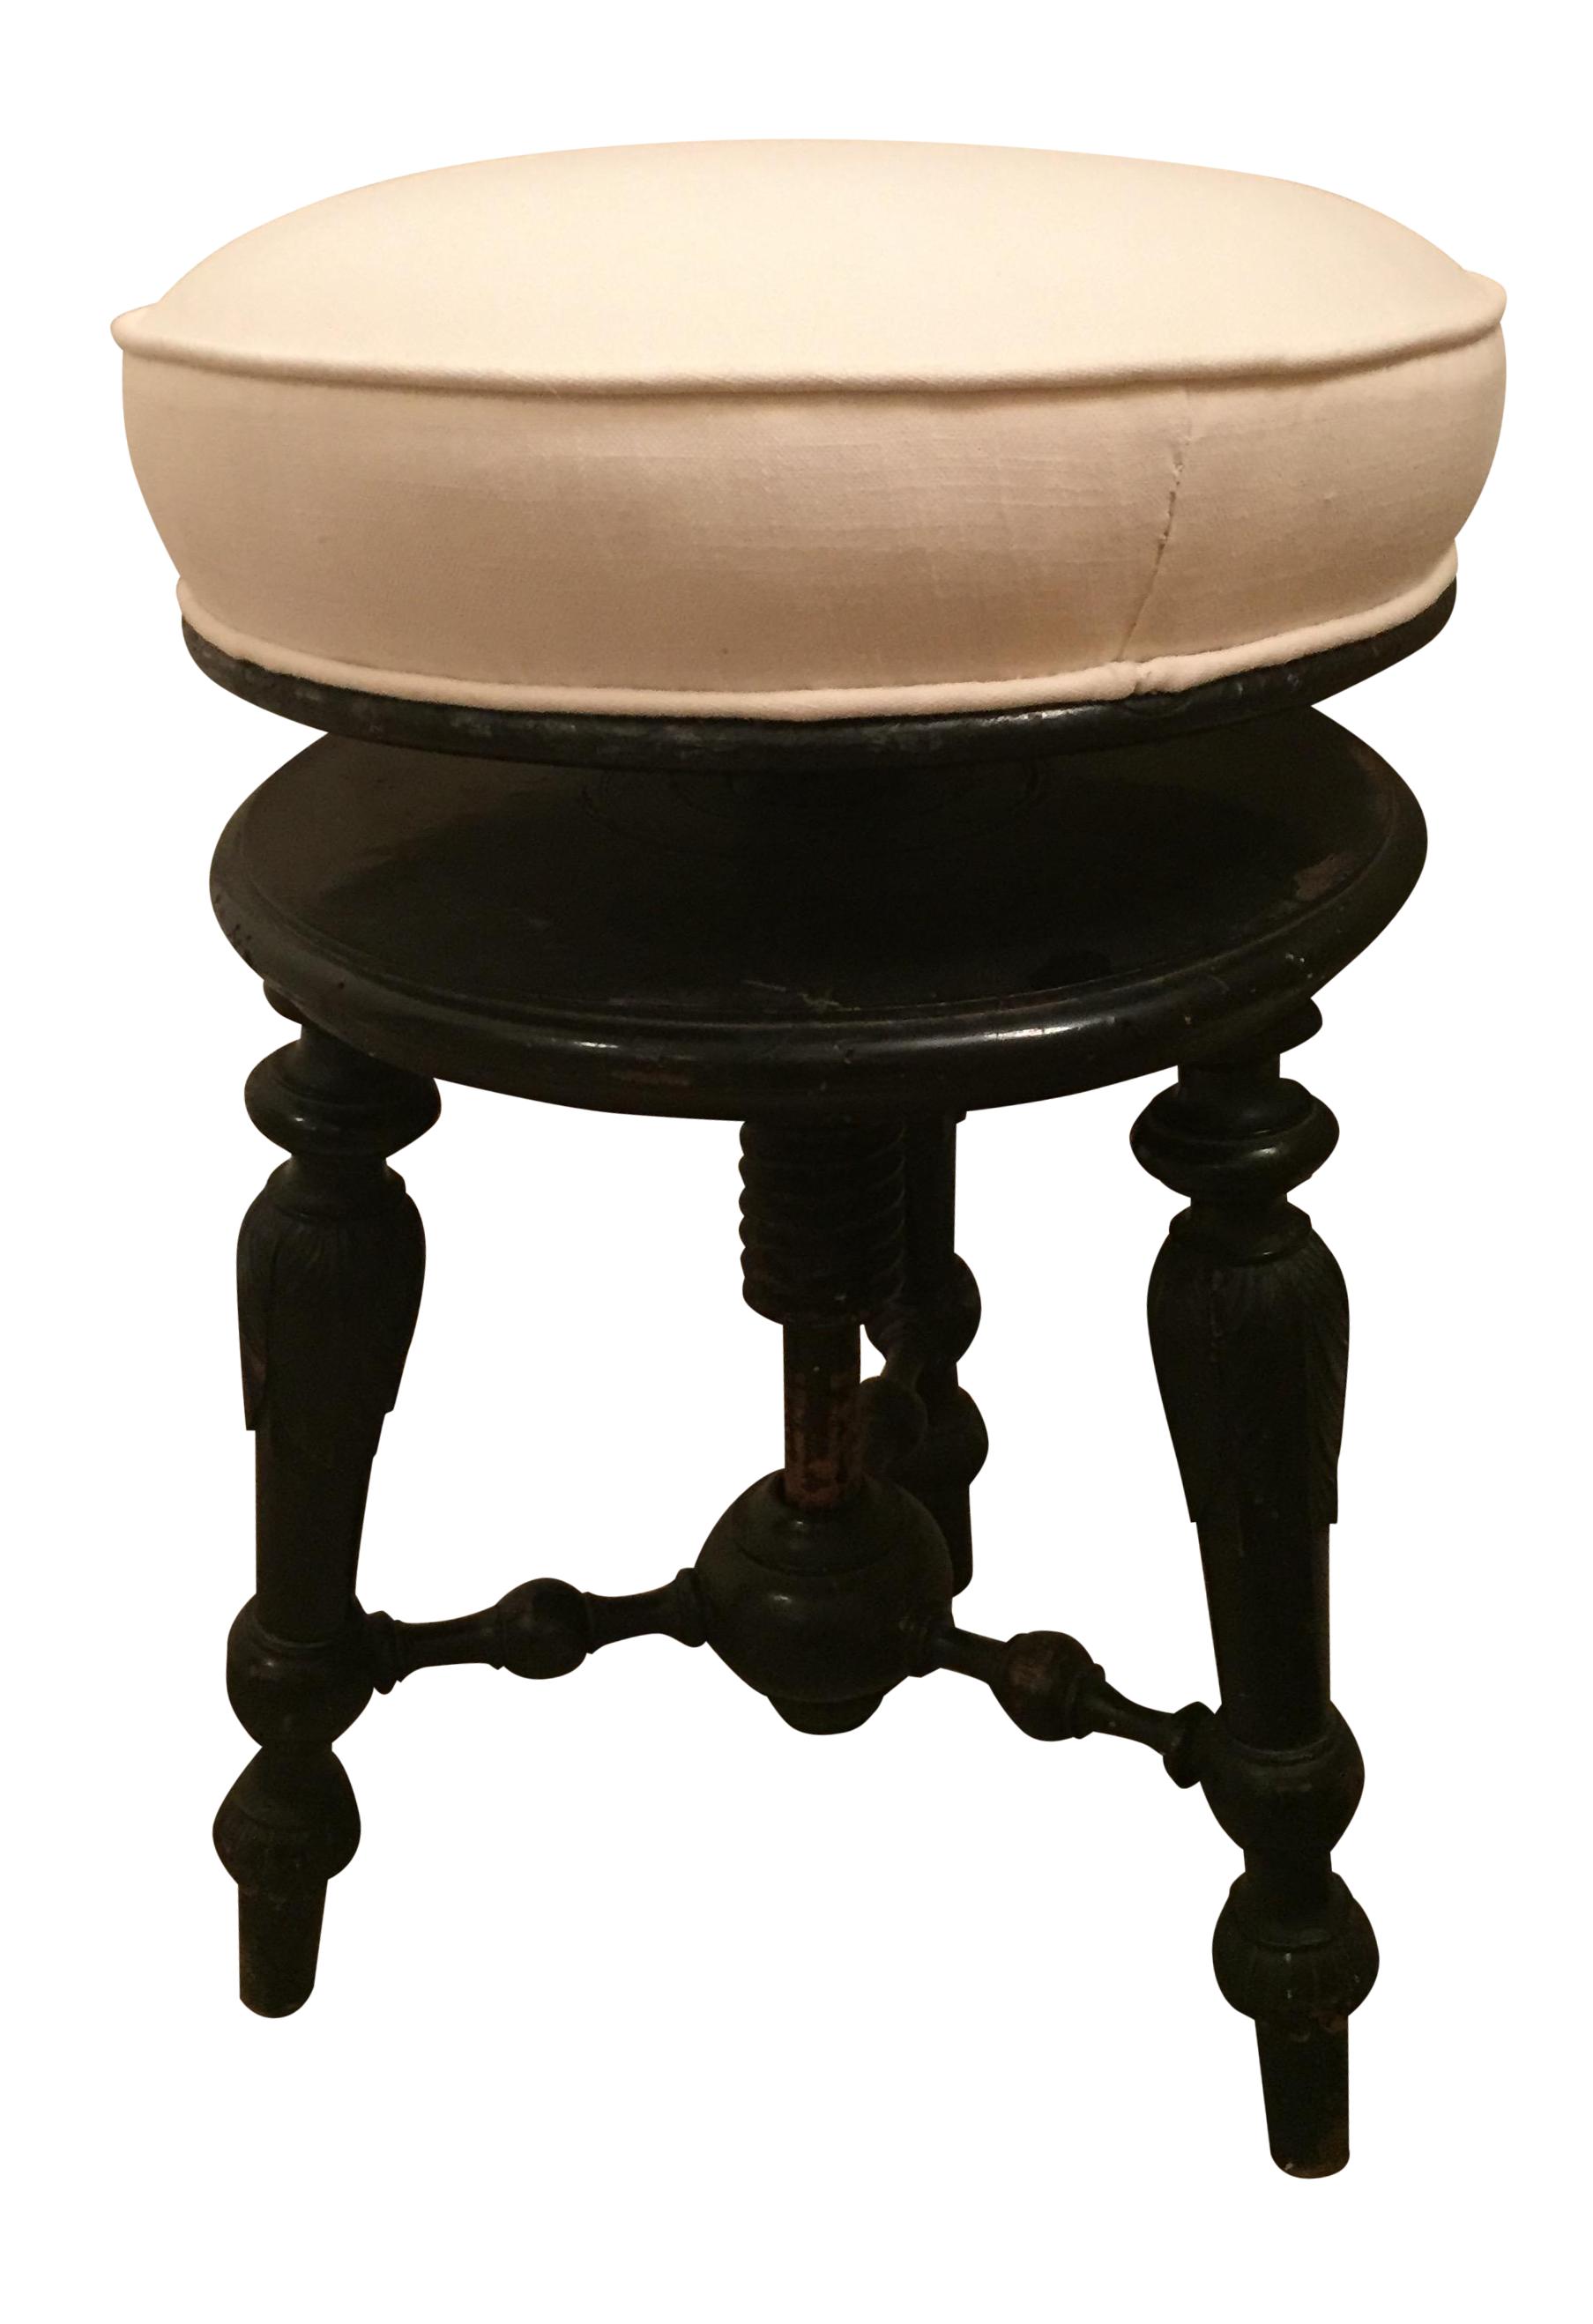 Antique Italian Piano Stool Chairish